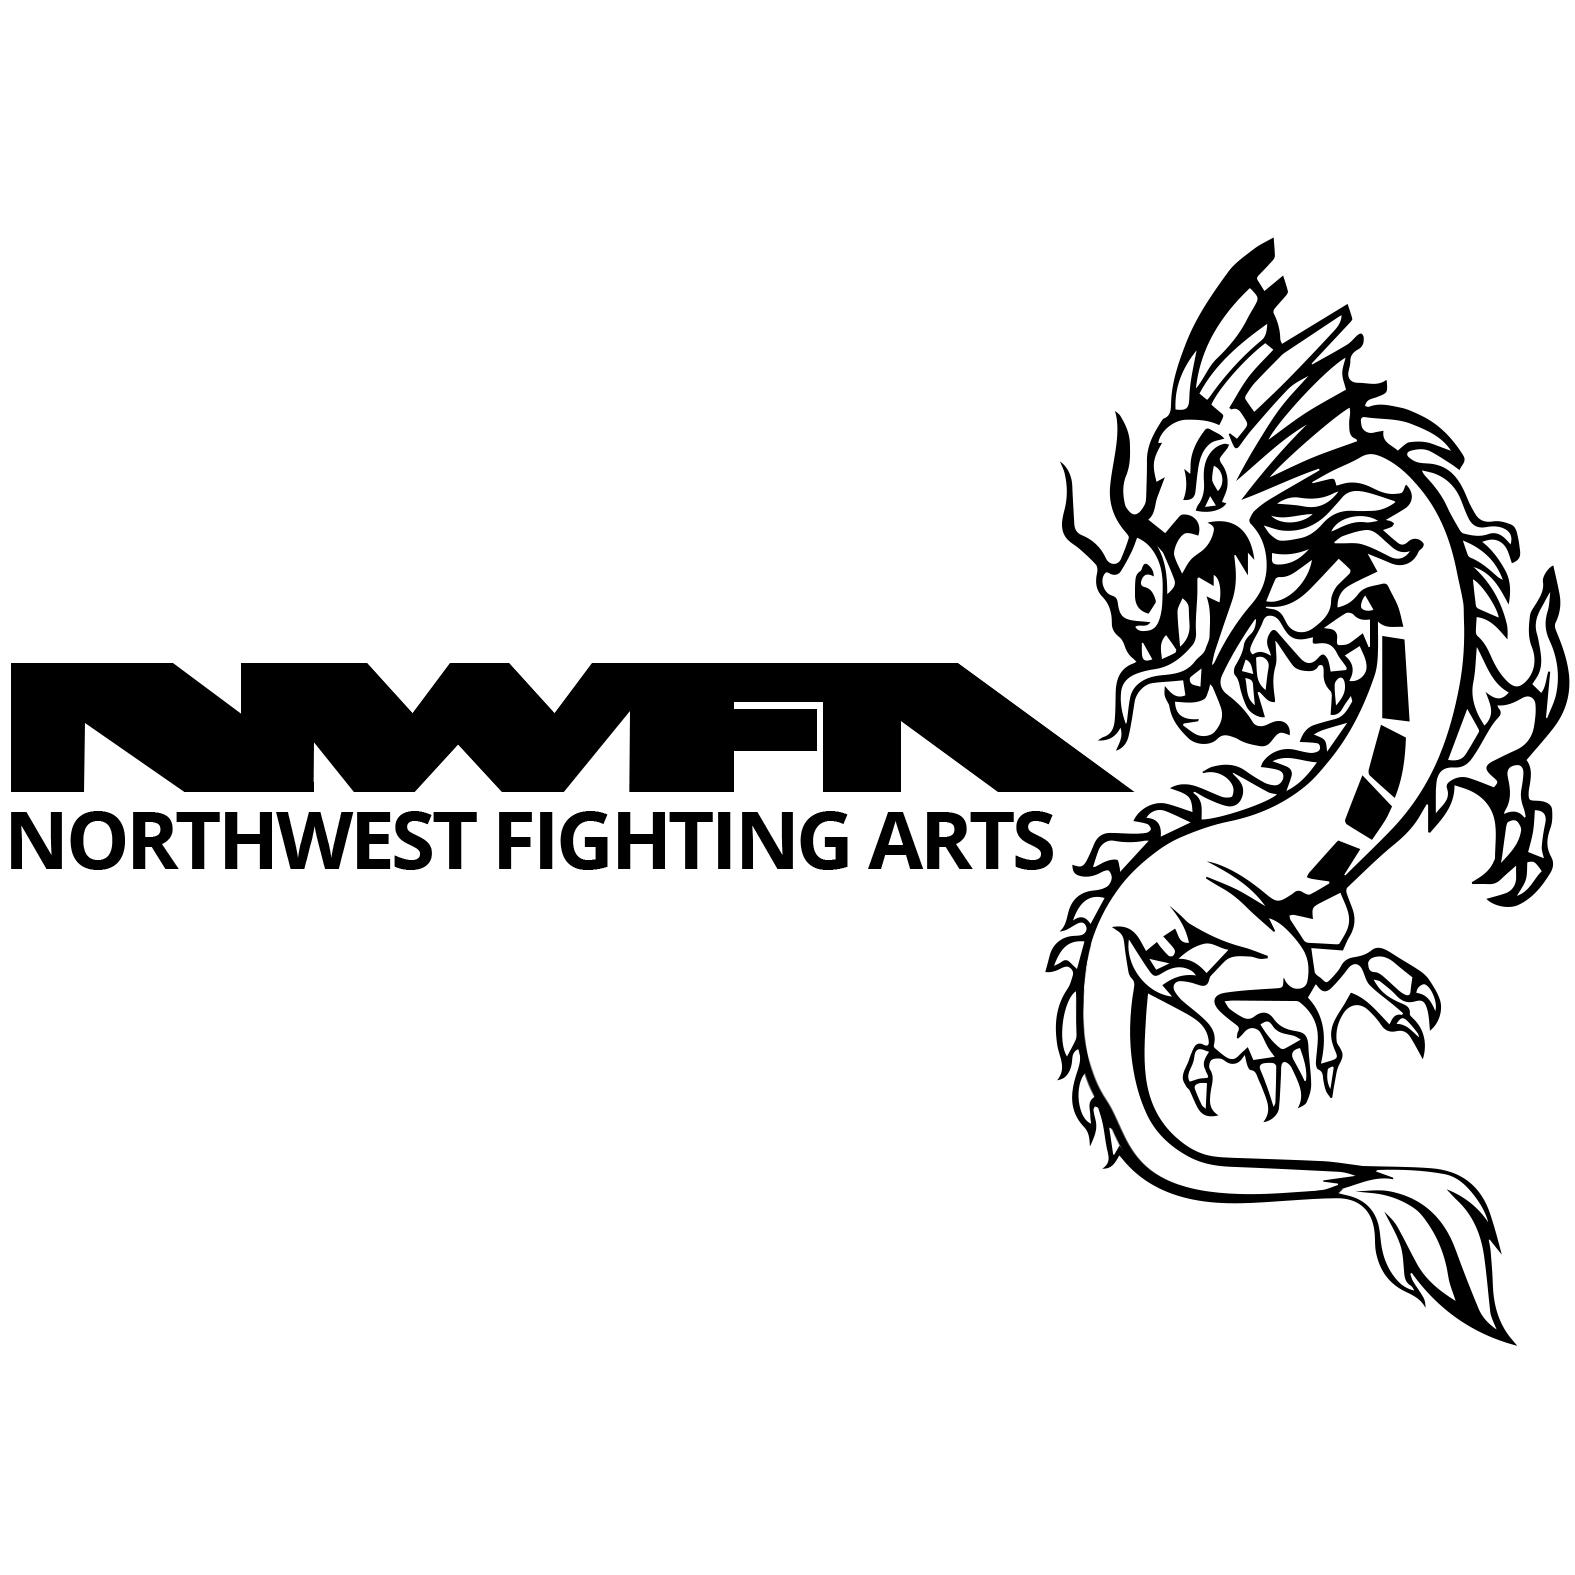 Northwest Fighting Arts